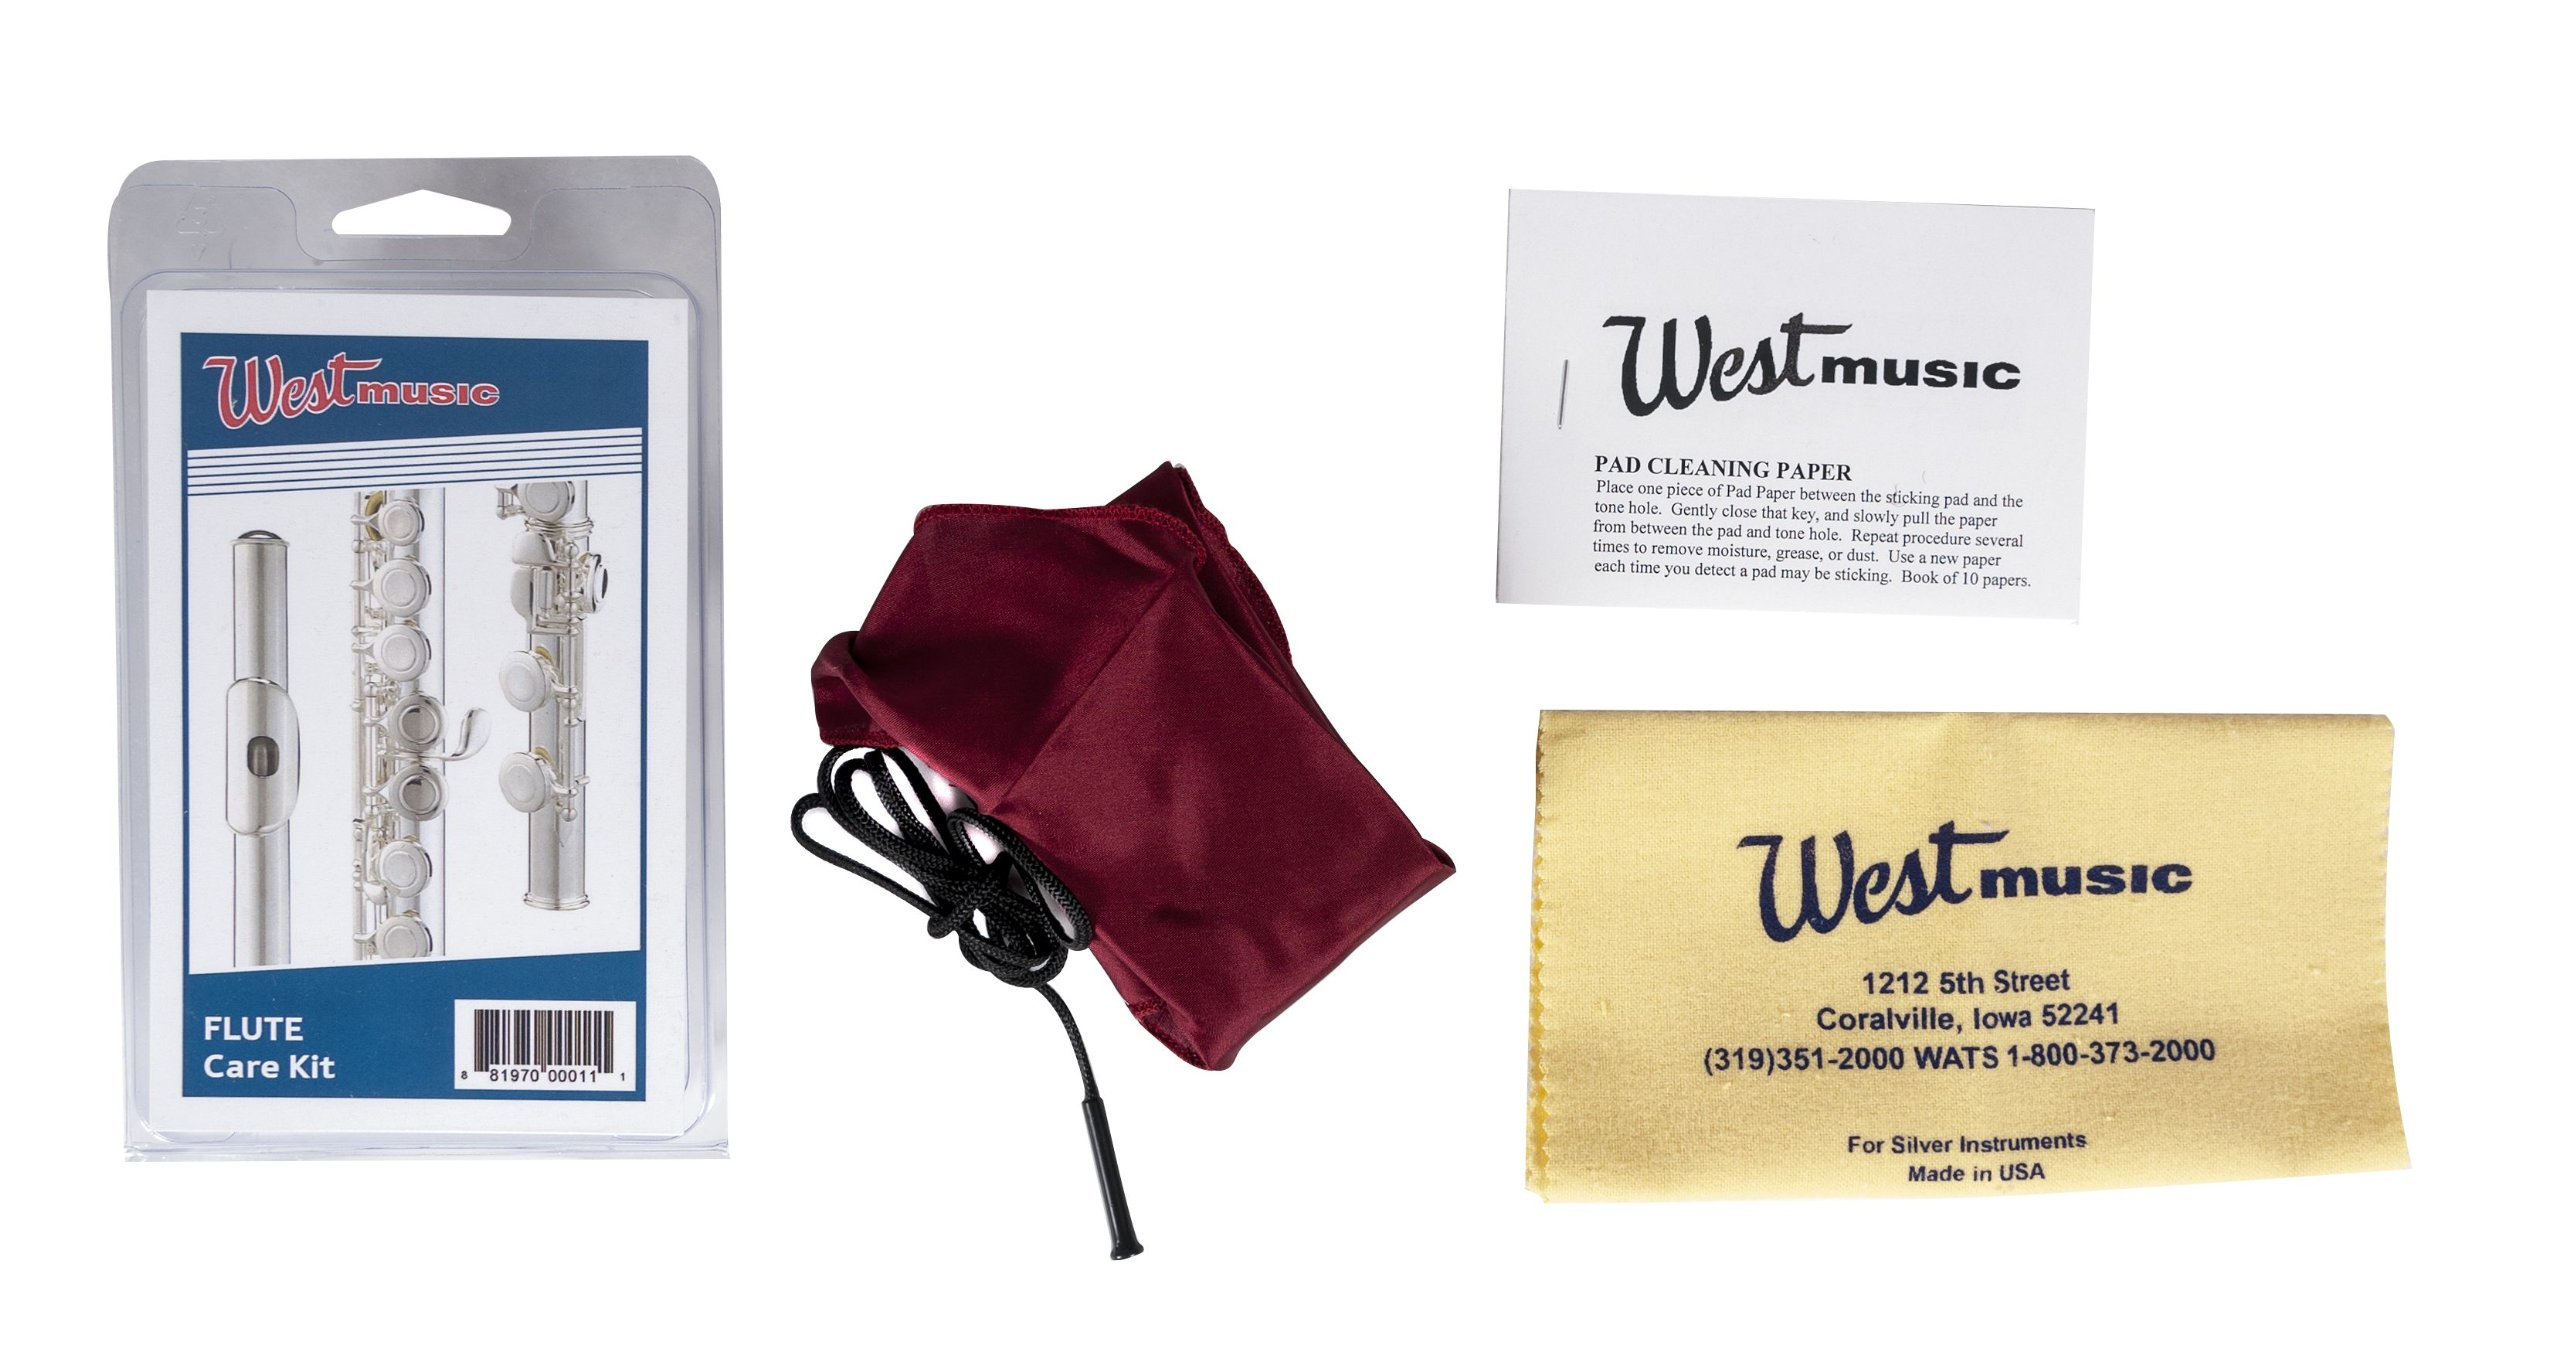 West Music Flute Care Kit